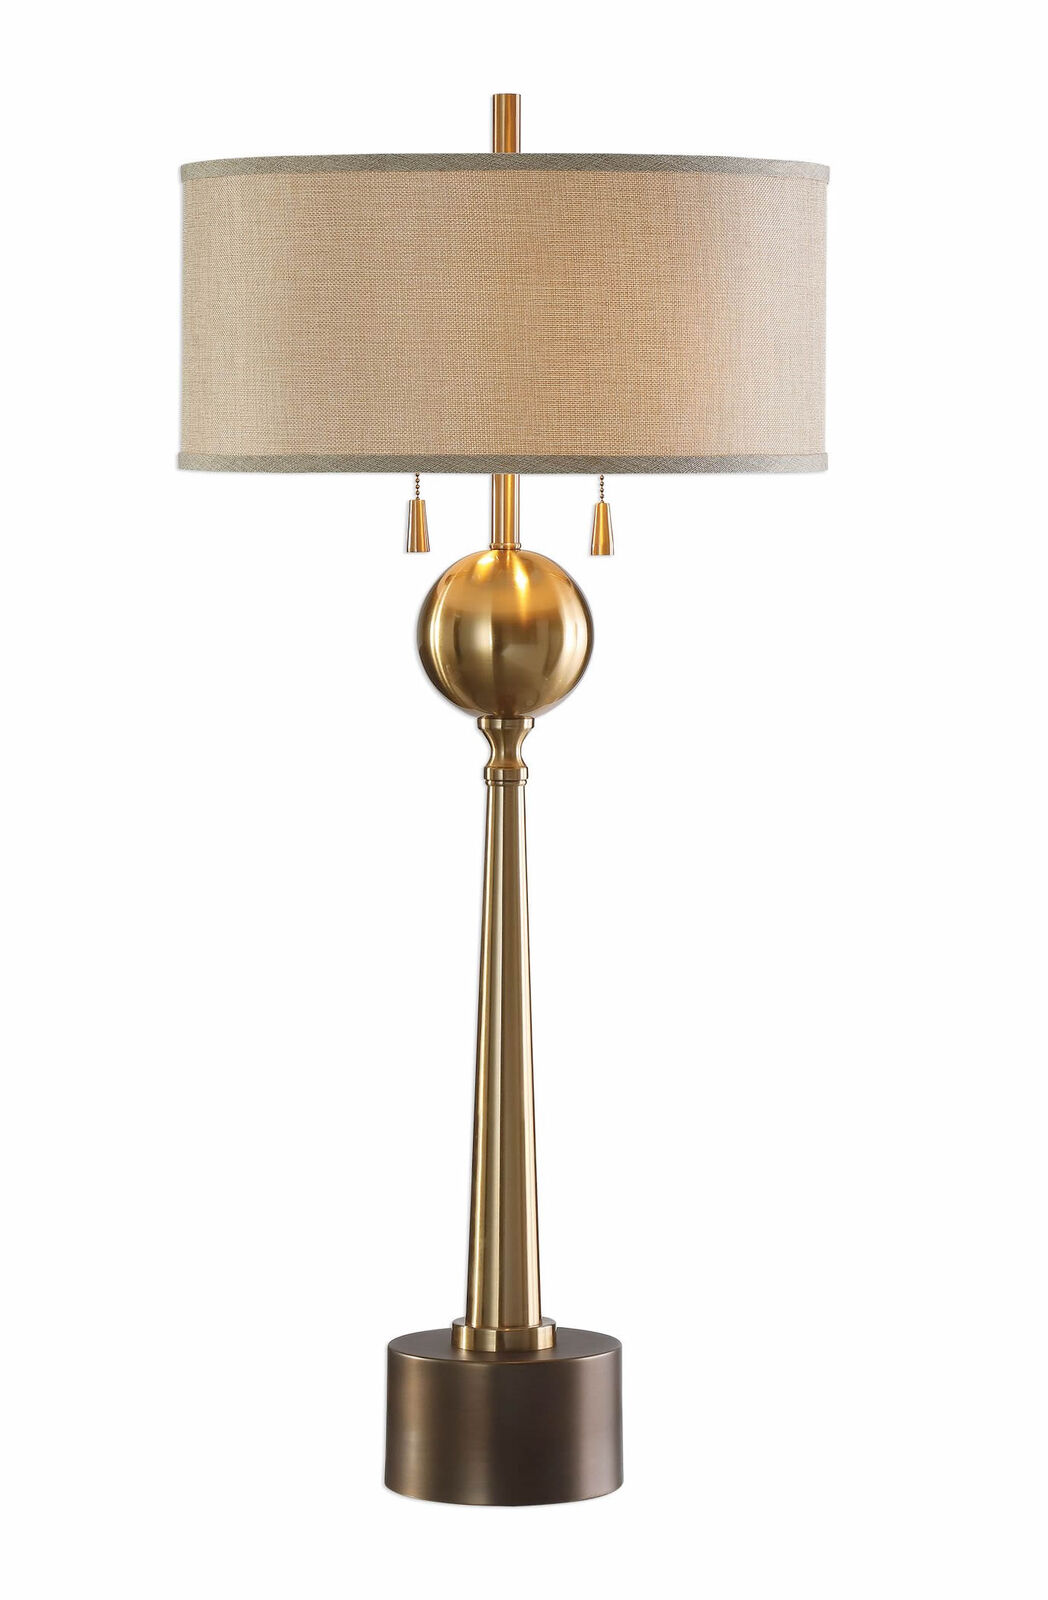 Kensett Antique Bronze Table Lamp by Uttermost  27772